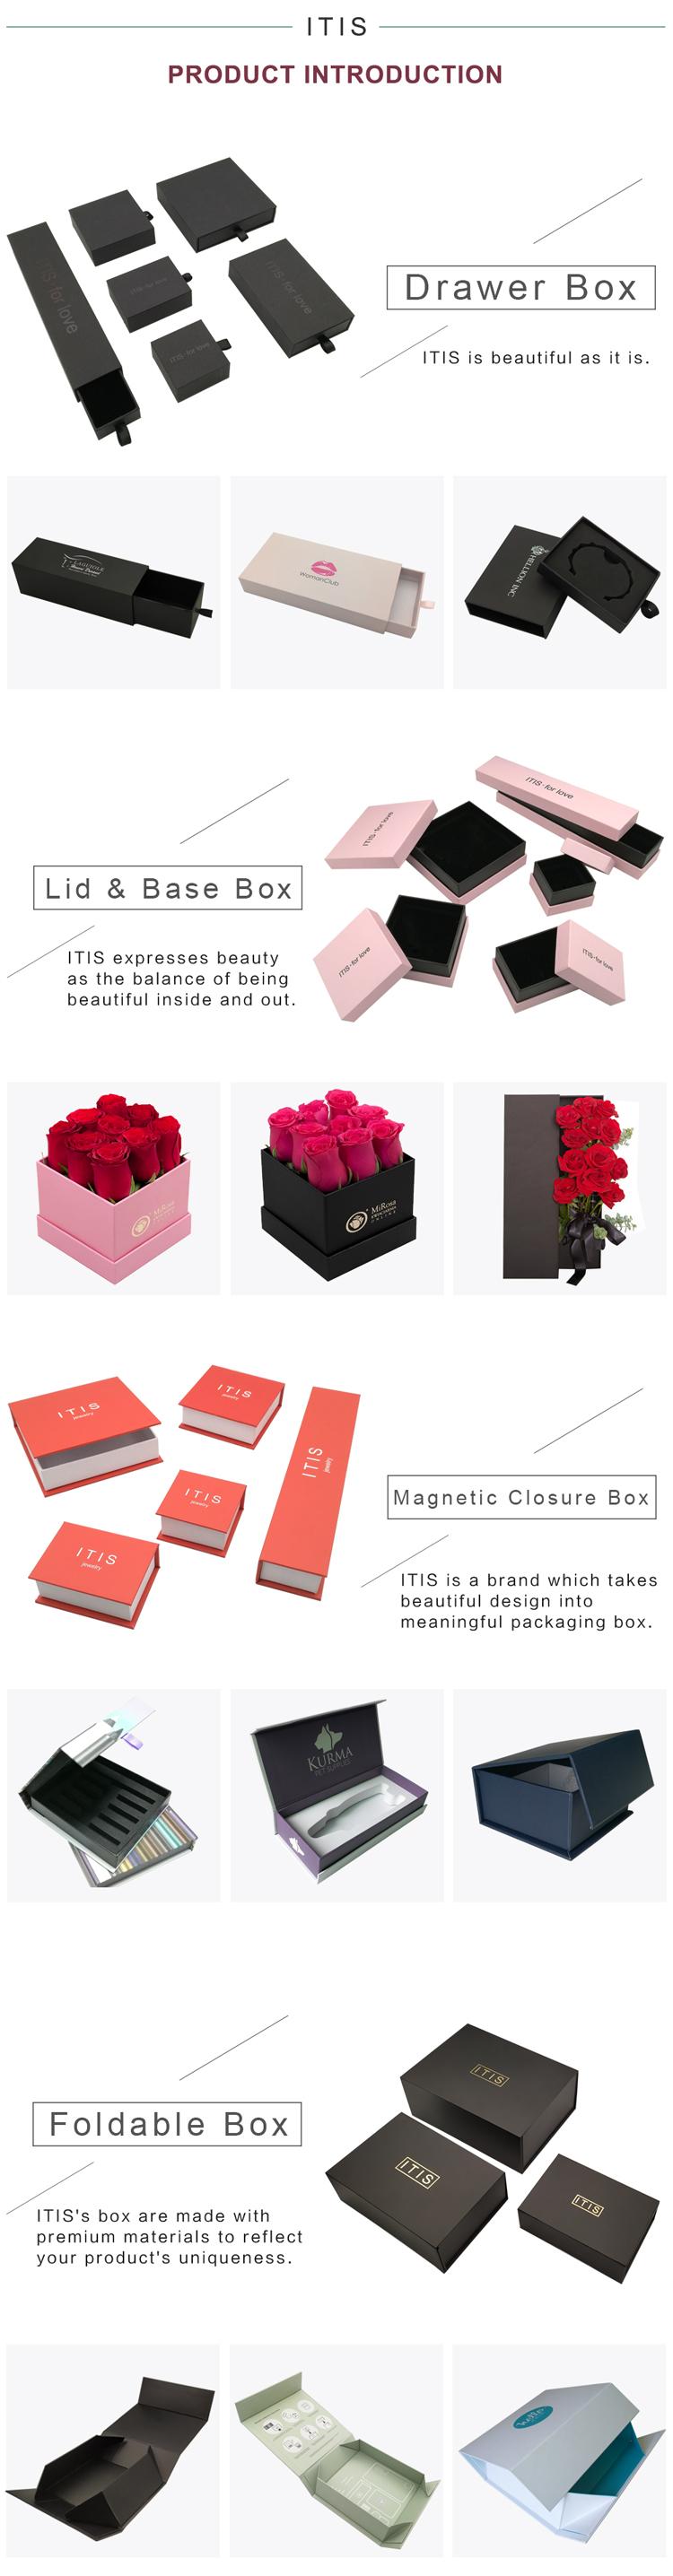 flower-box-01.jpg